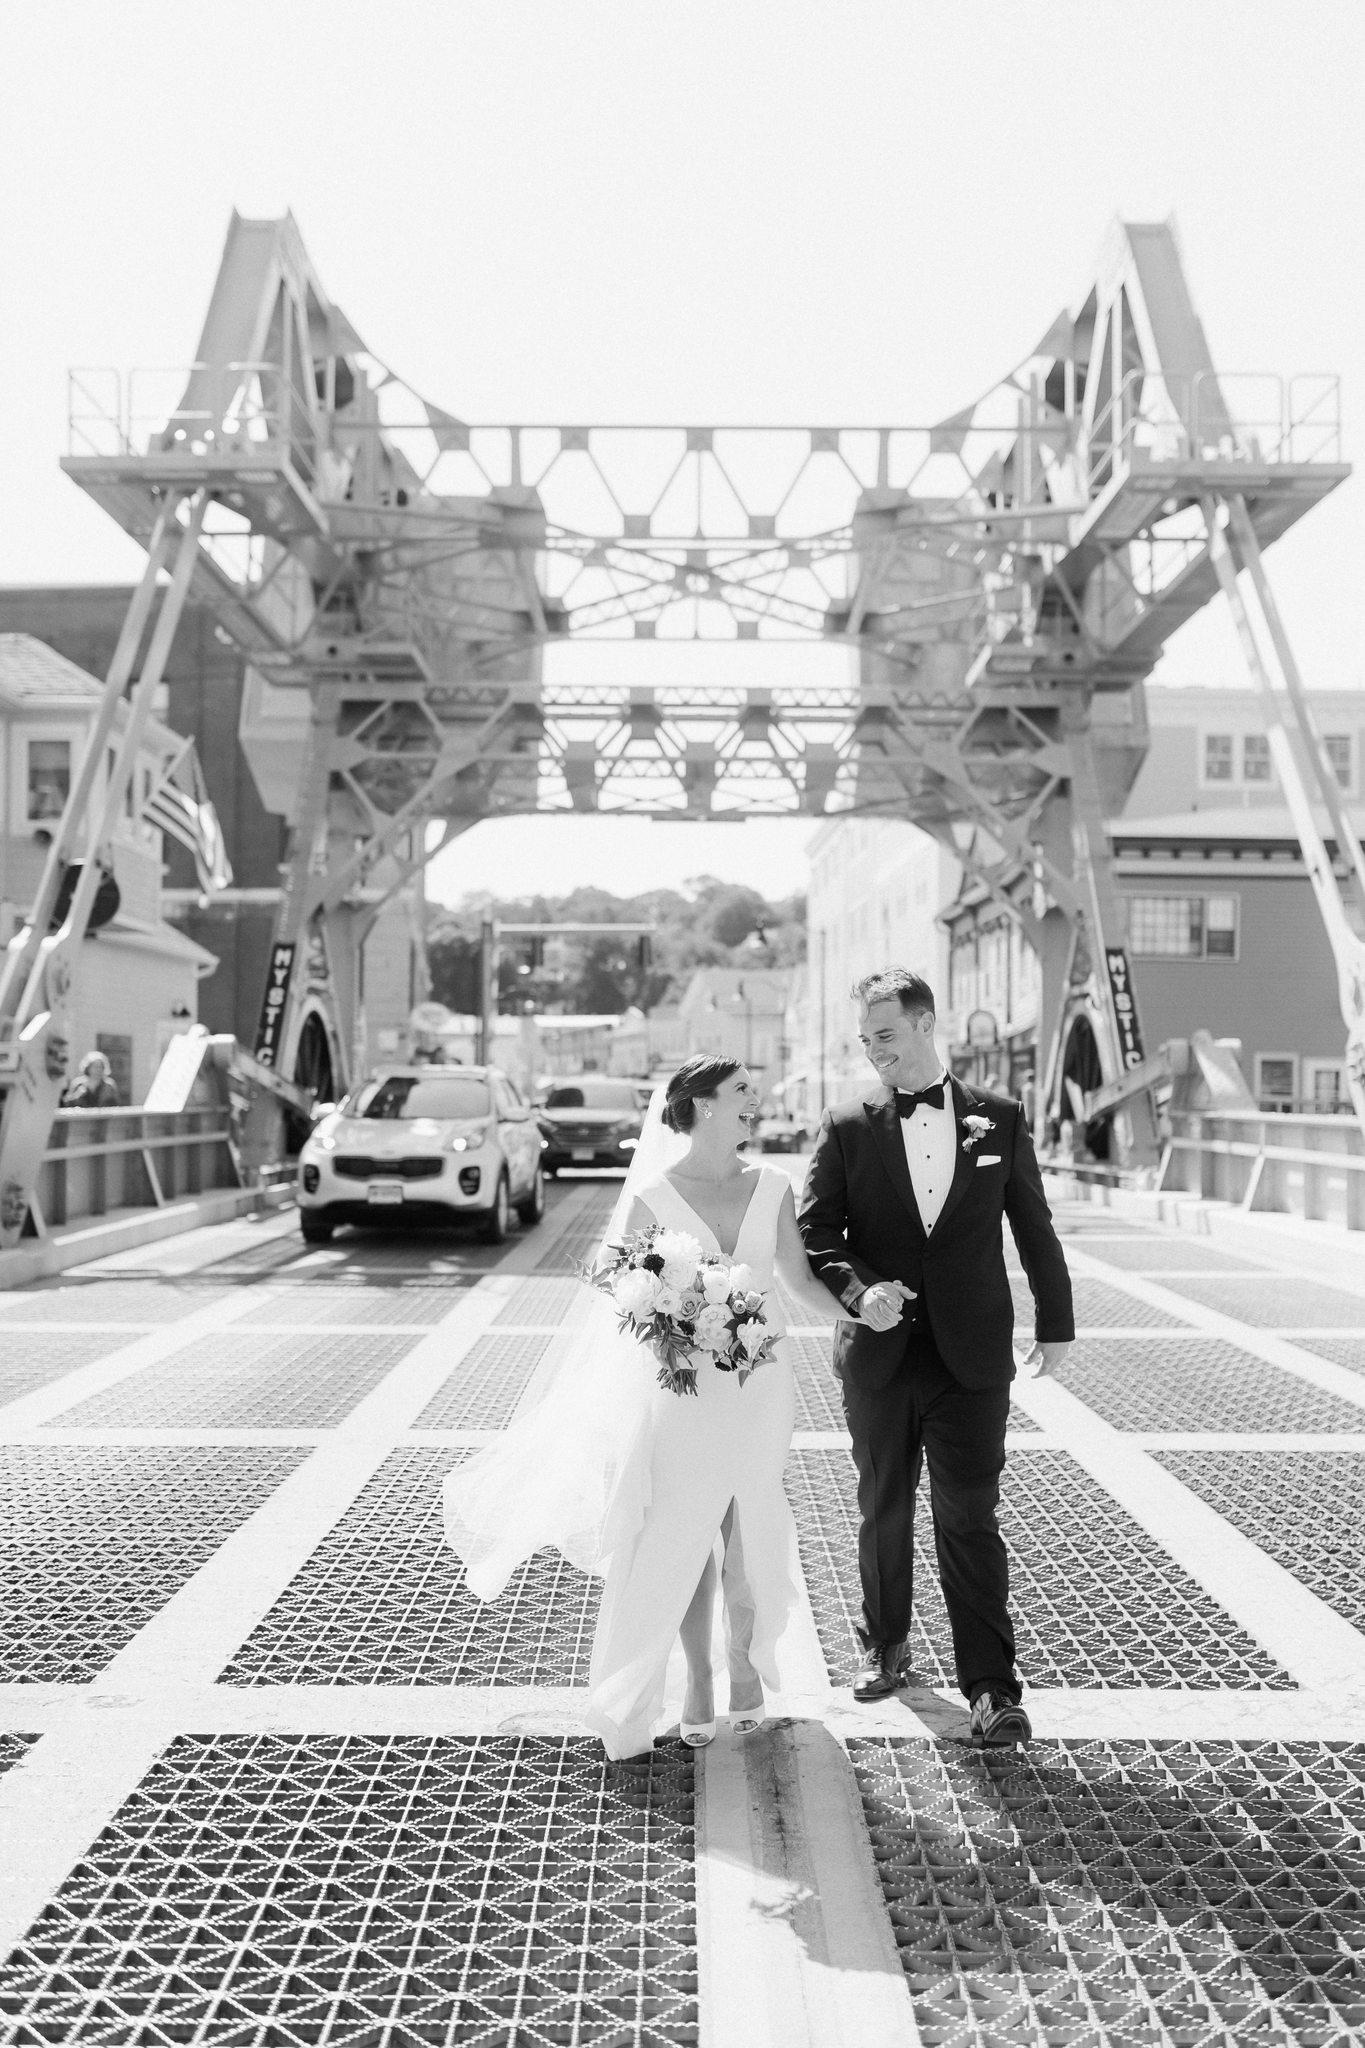 mystic wedding photos_mystic bridge wedding photo__ct wedding_ct wedding photographer-1.jpg